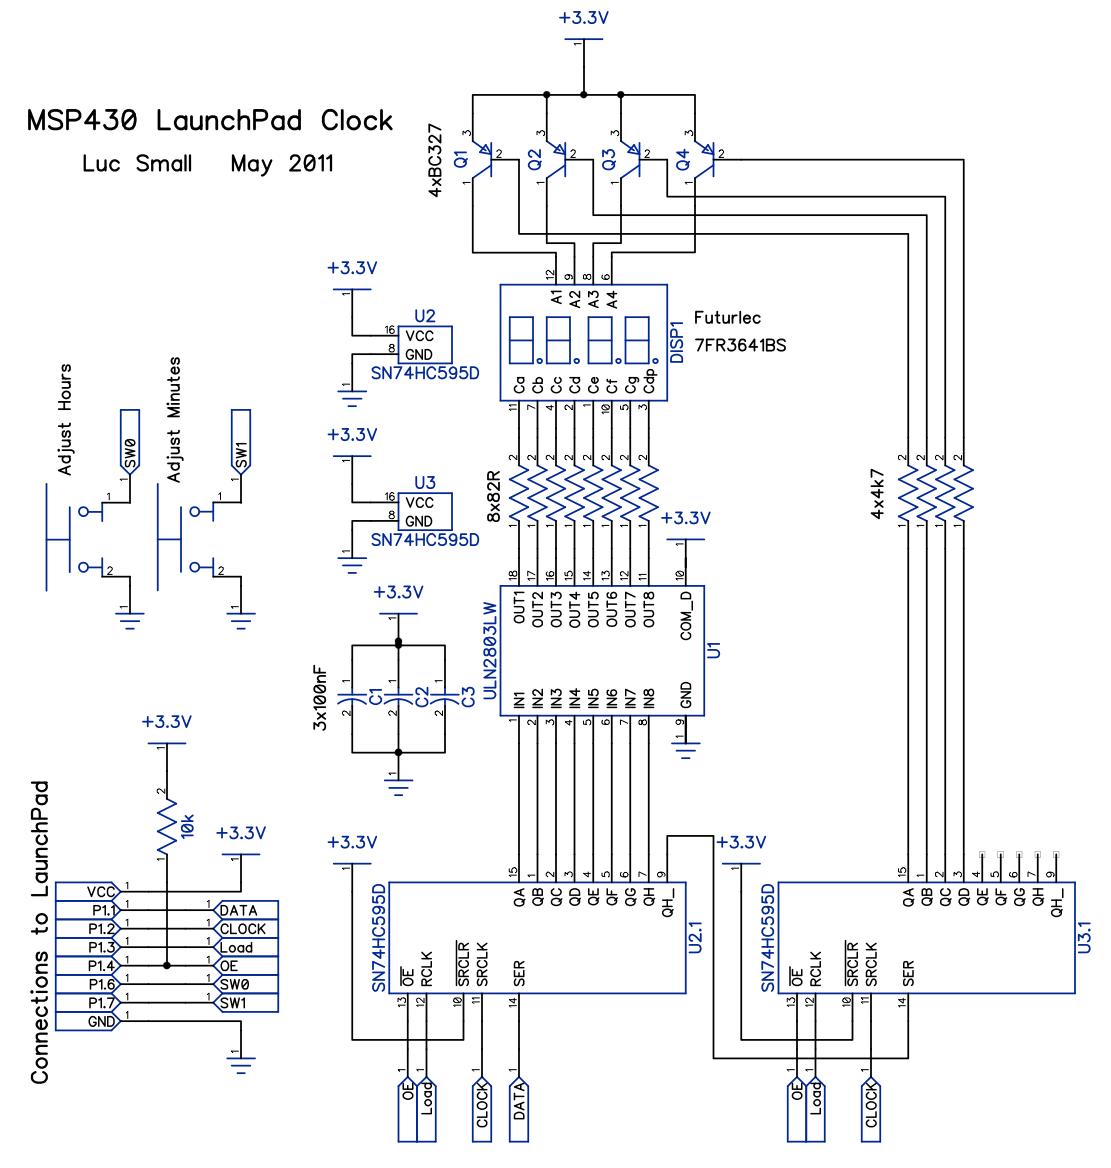 Msp430 Launchpad Clock 7 Segment Display Block Diagram The